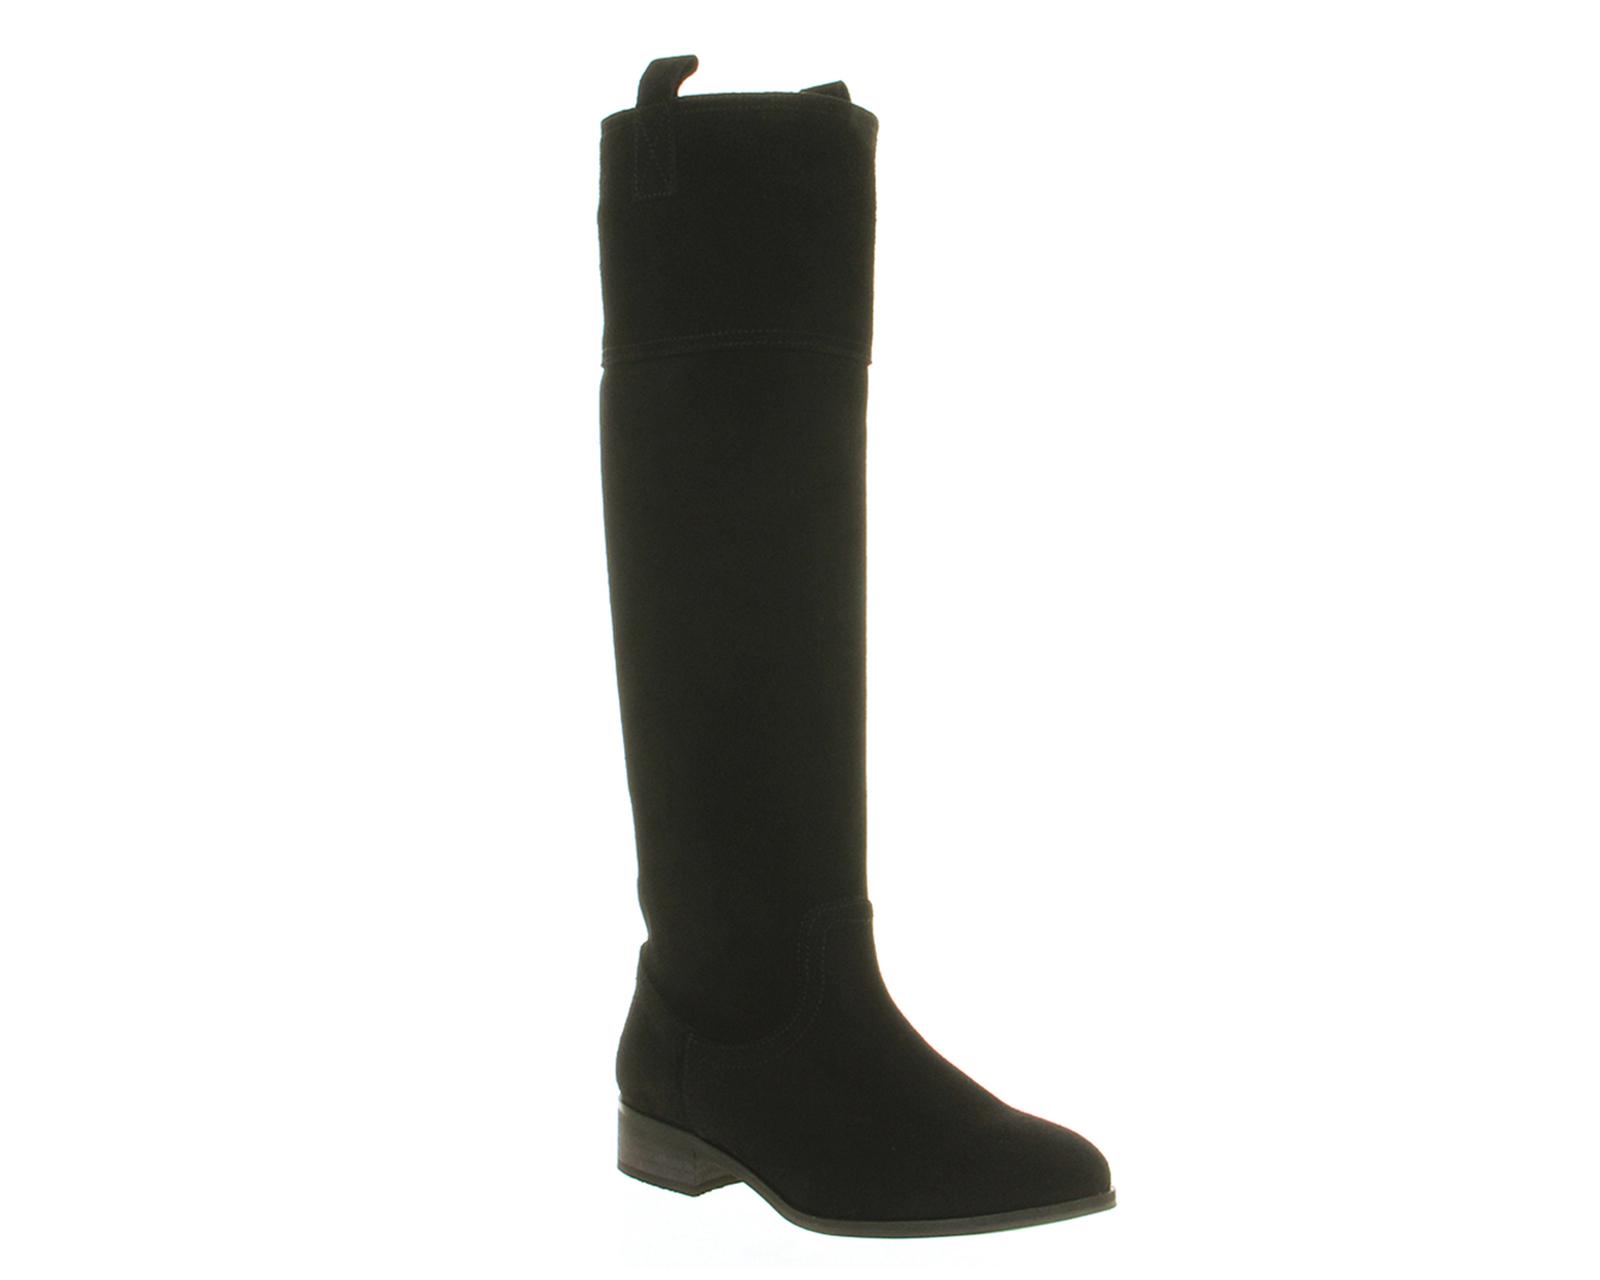 Creative Desert Boot Black Suede  Originals Womens Boots  Clarks Shoes